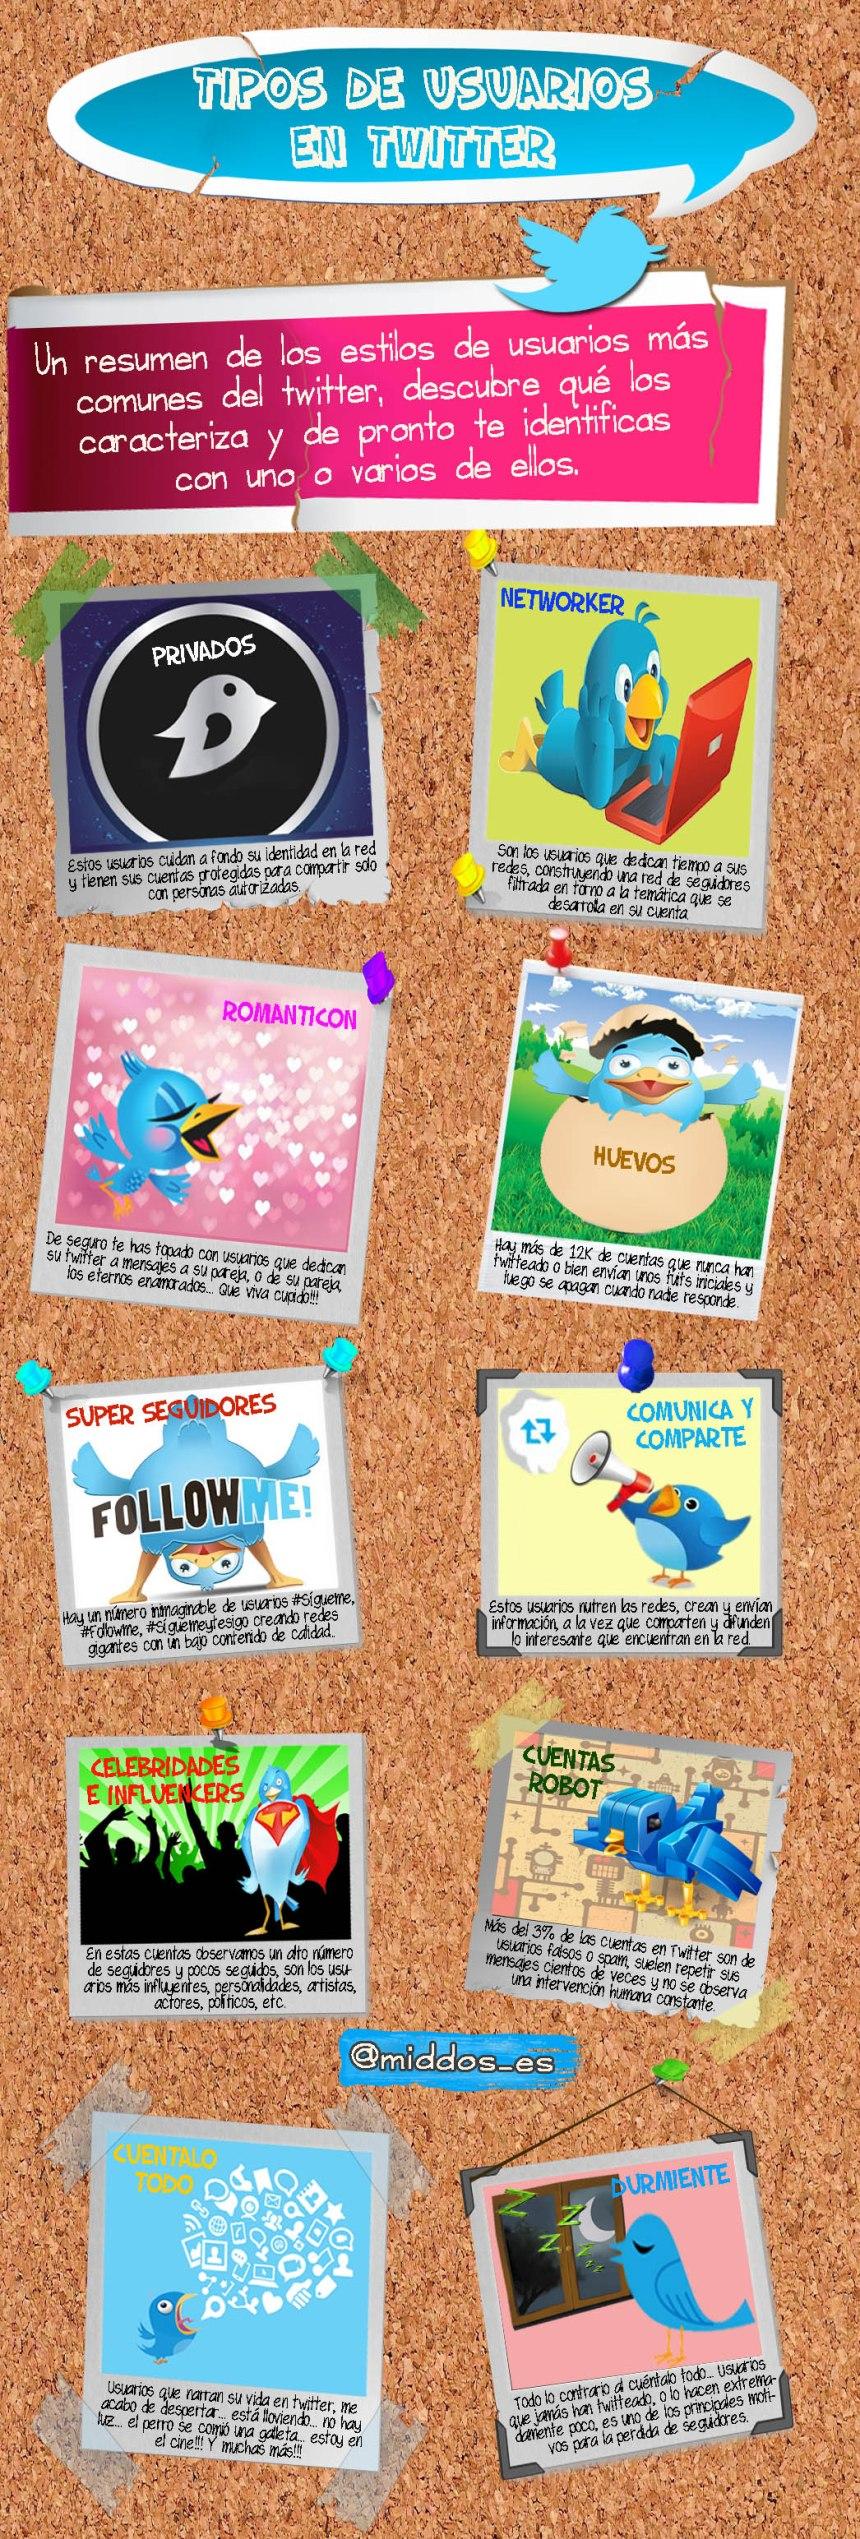 10 tipos de usuarios en Twitter